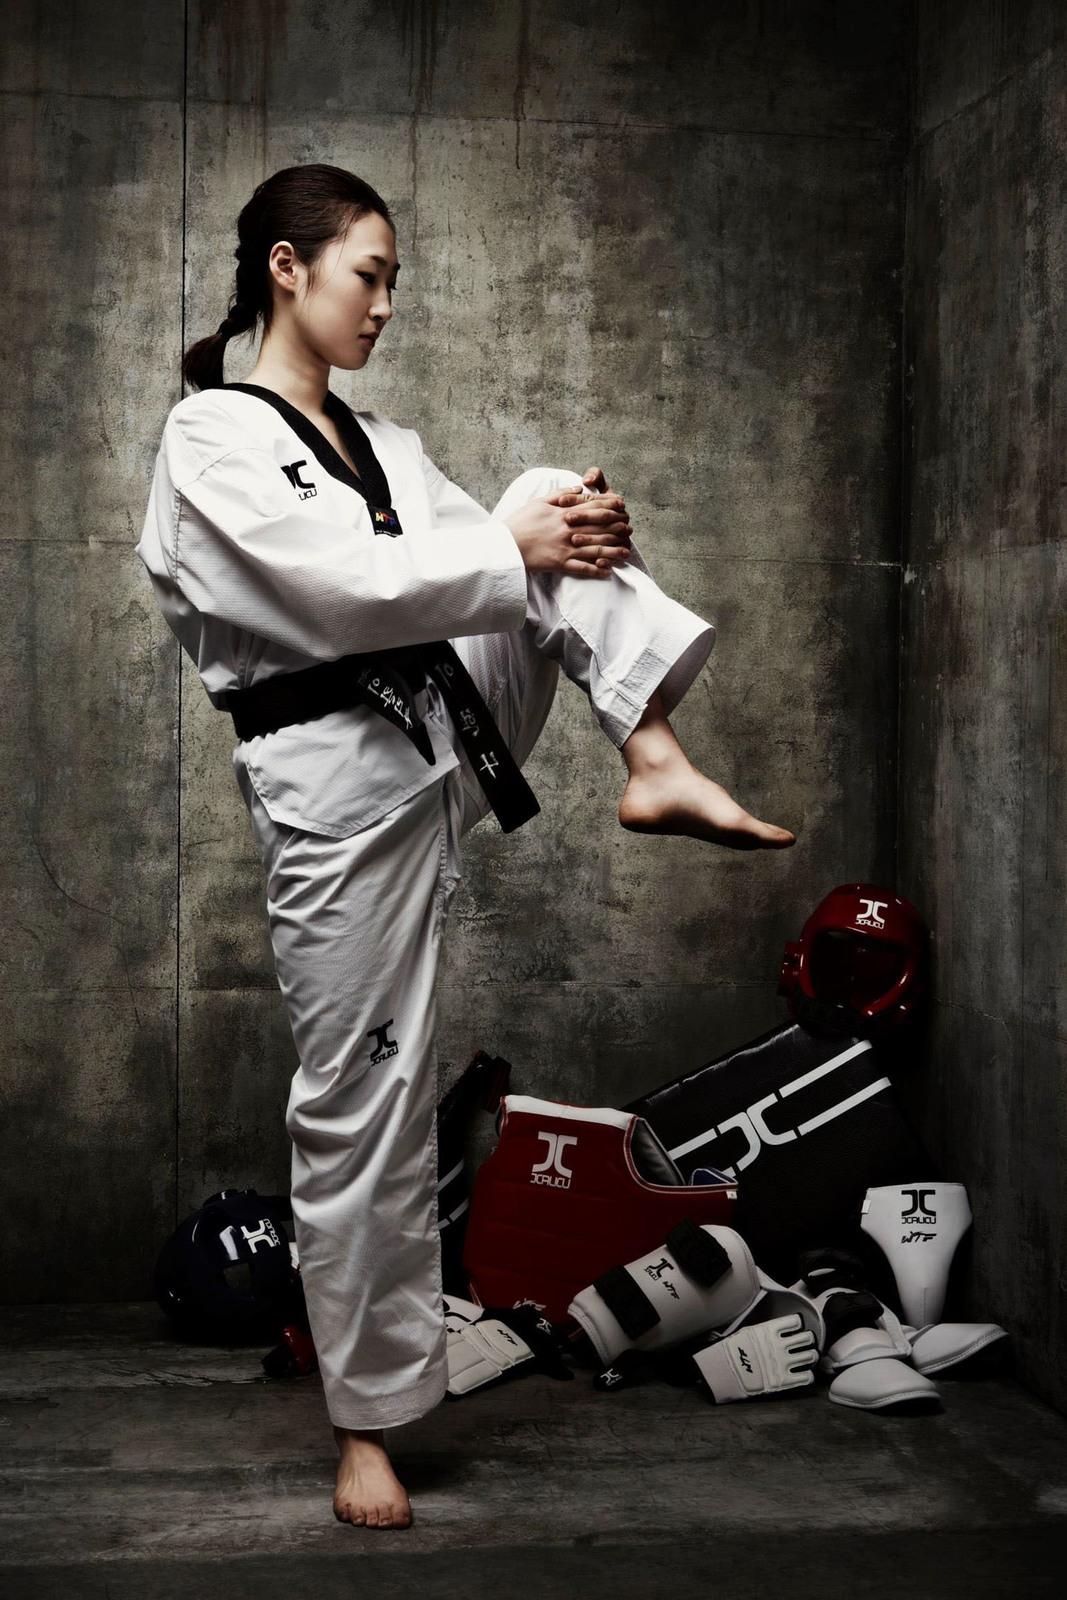 Dan Gyoguri Sparring Uniform Black V-neck and 50 similar items